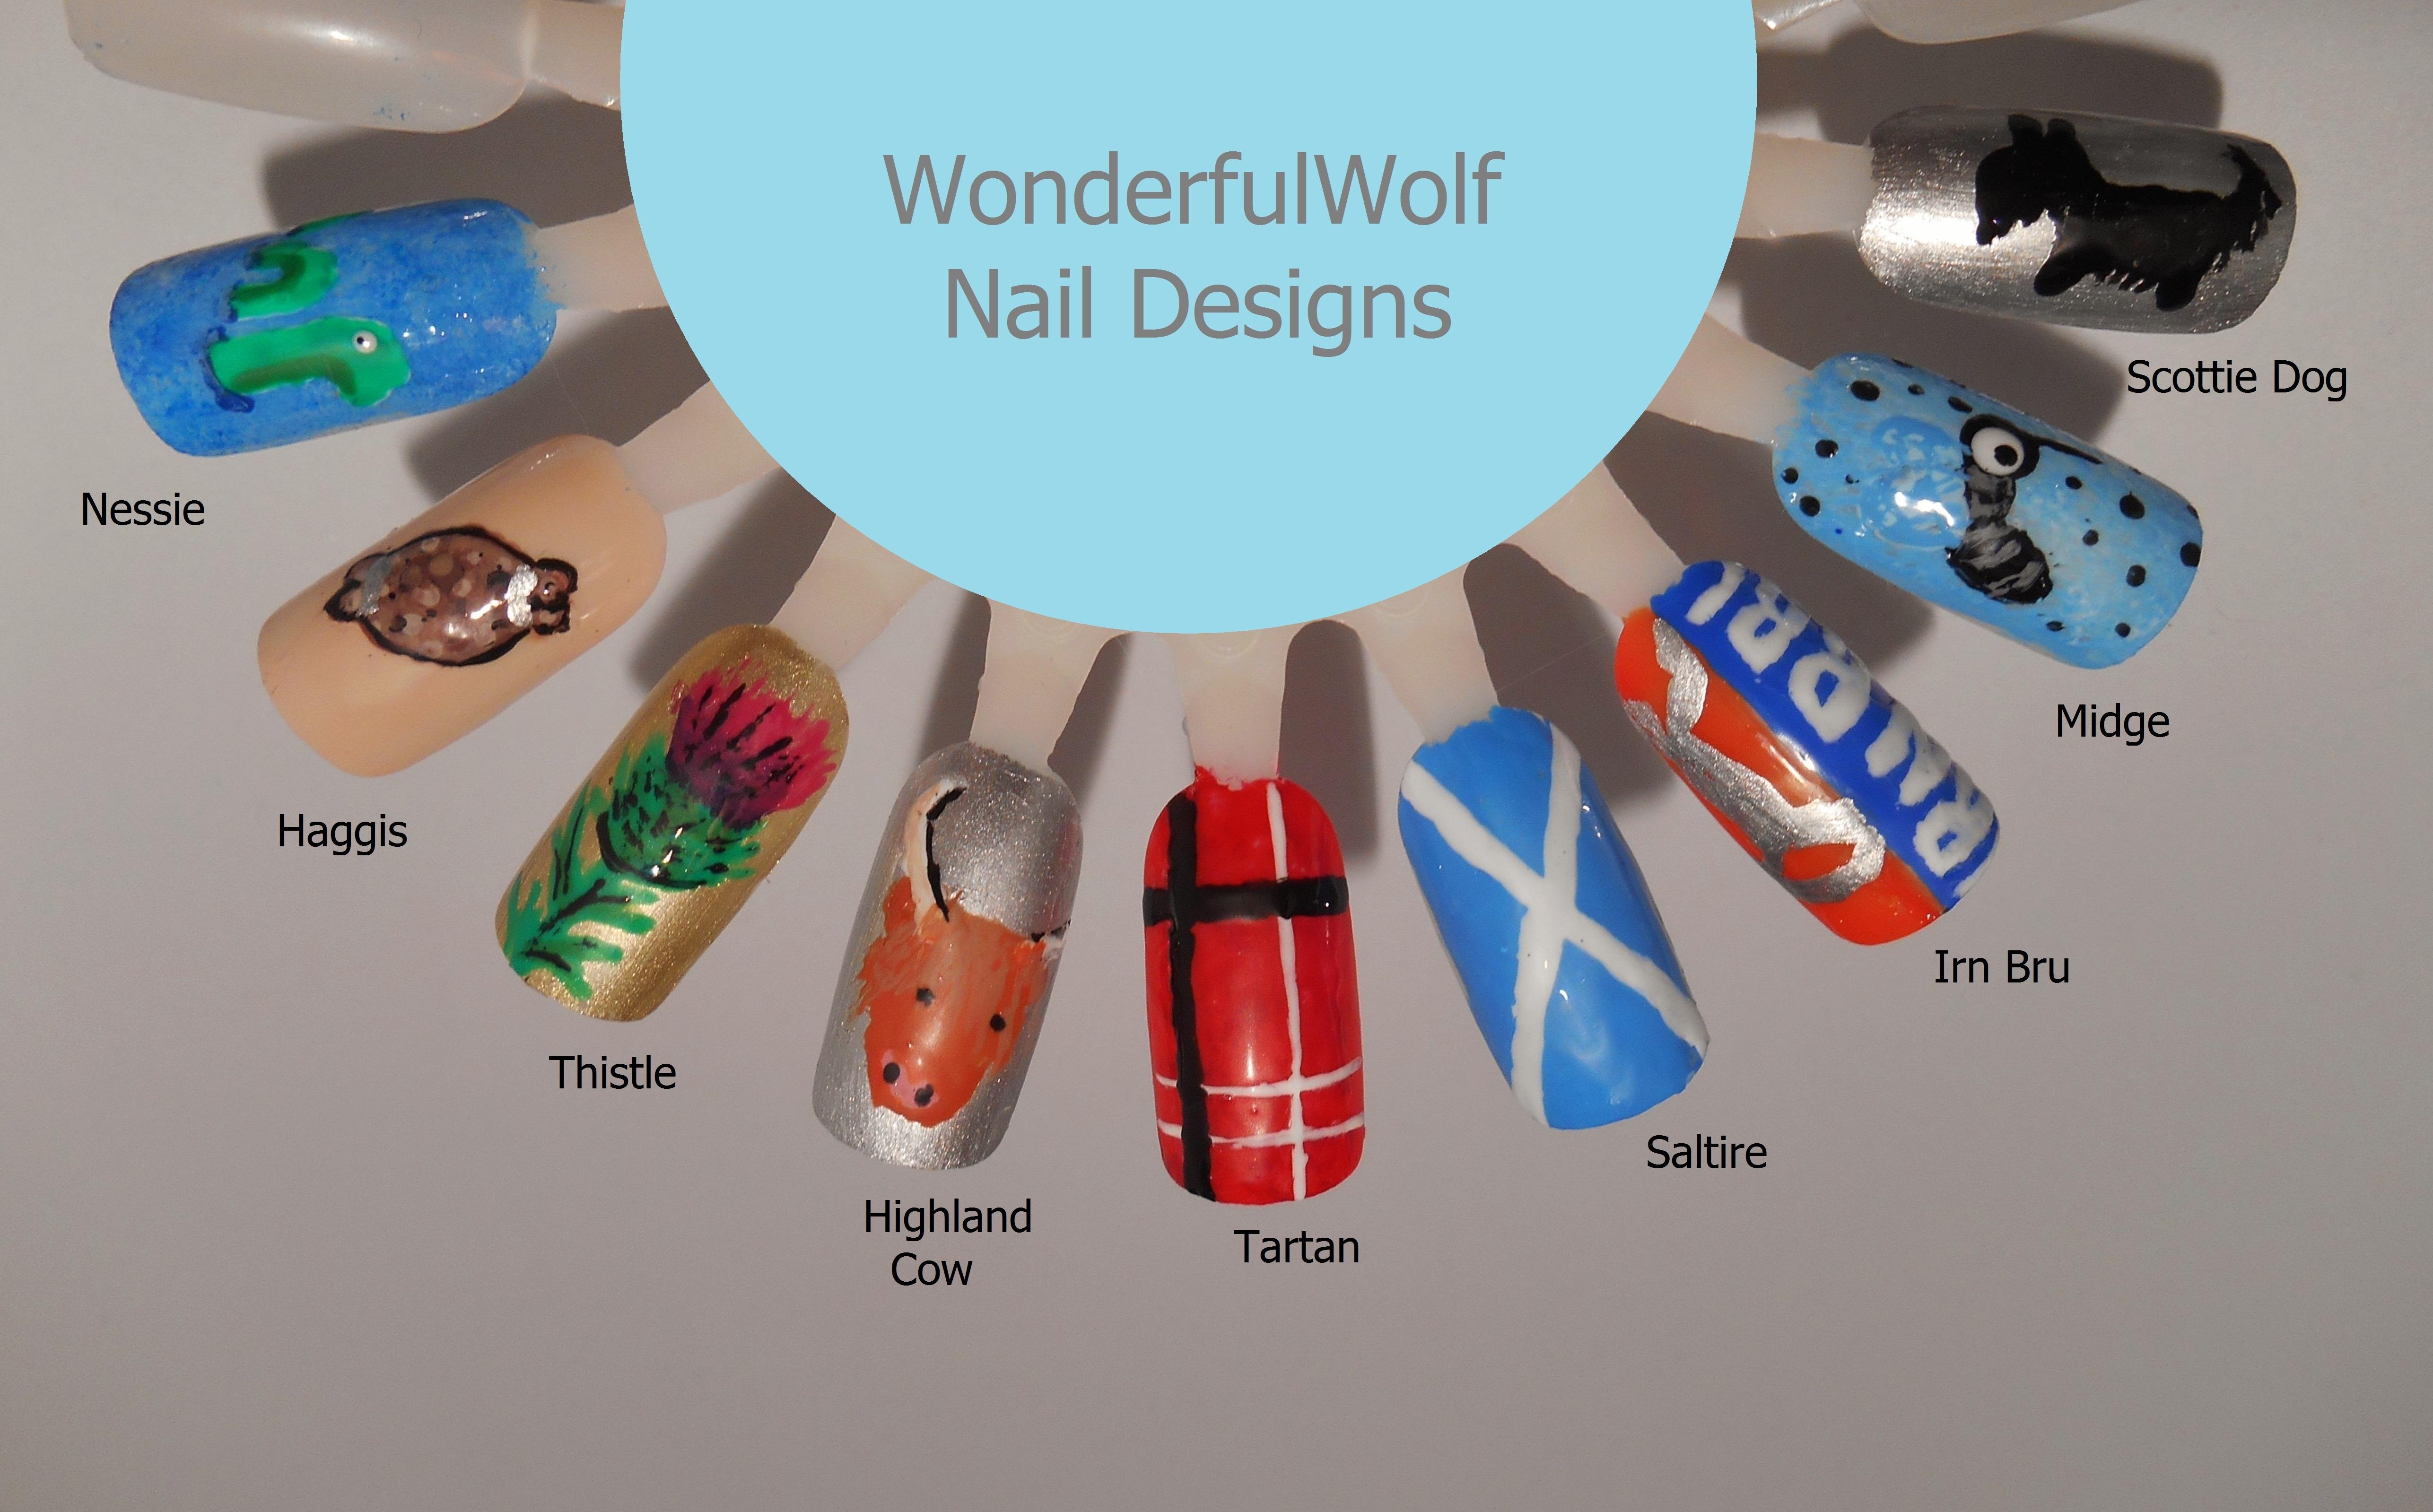 Thistle Nail Art Wonderfulwolf